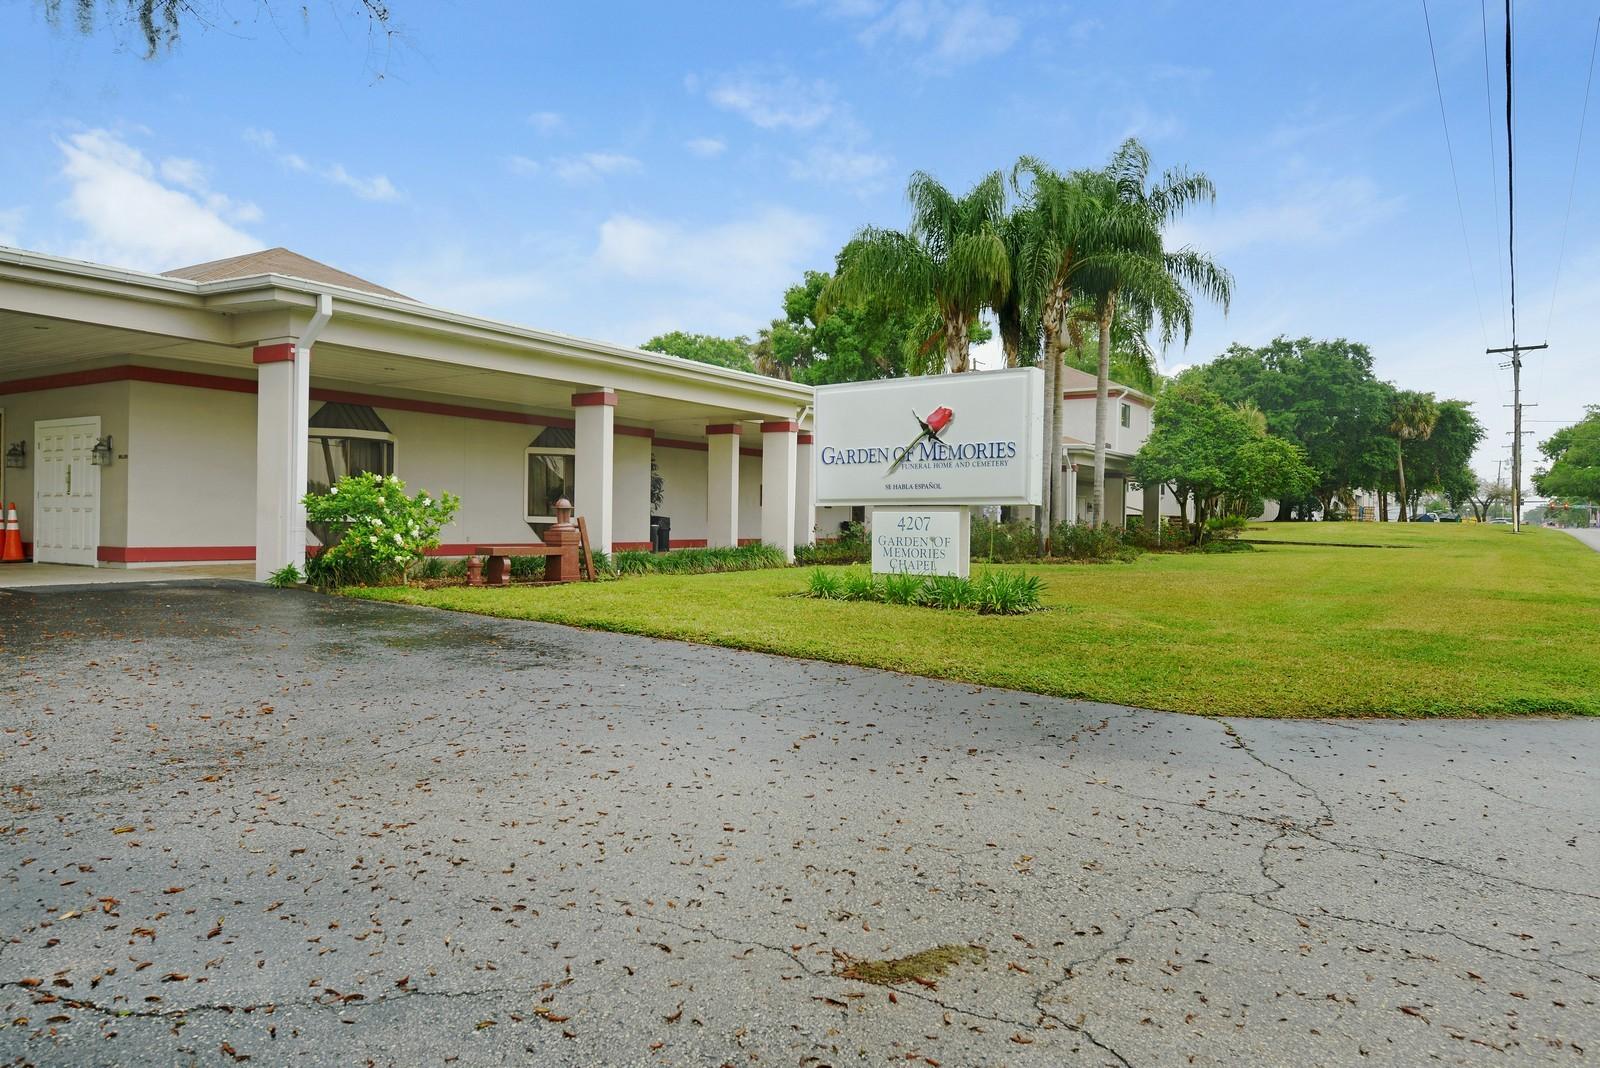 fl real estate photography 4207 east lake ave garden of memories tampa - Garden Of Memories Funeral Home